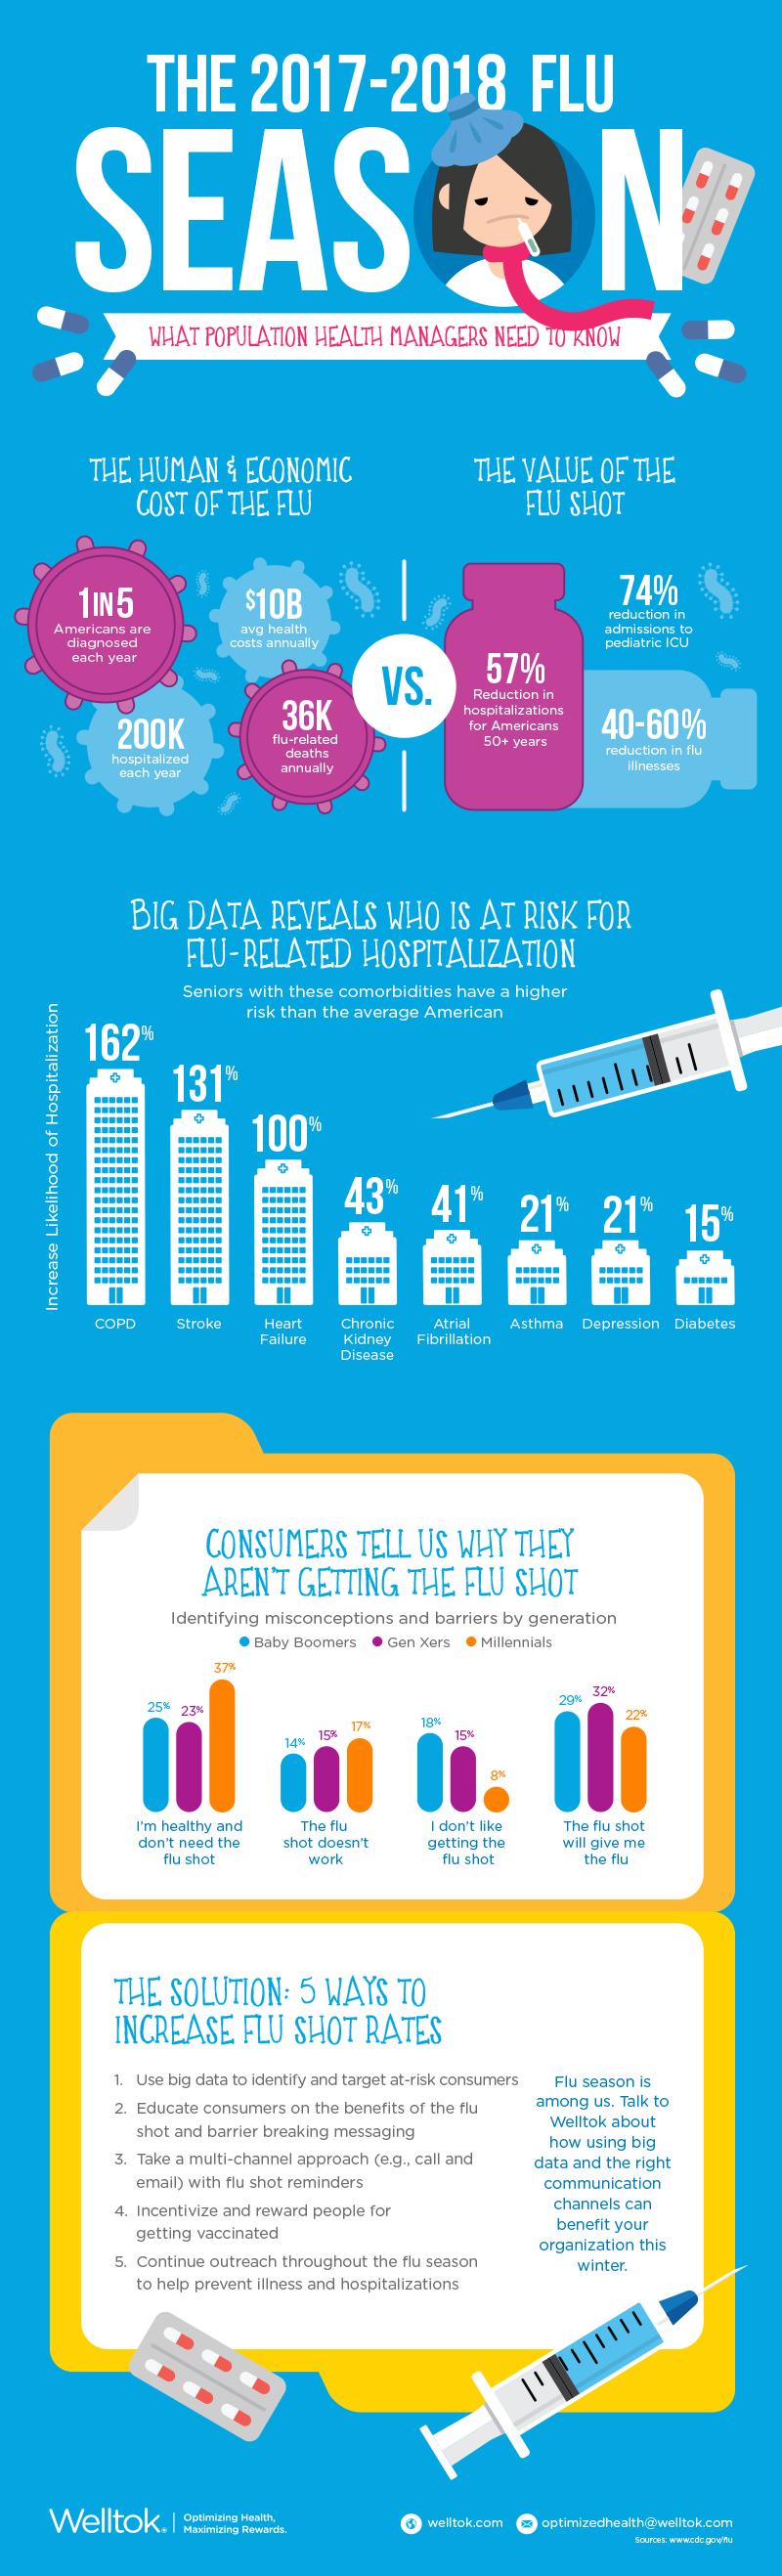 flu_season_infographic.png